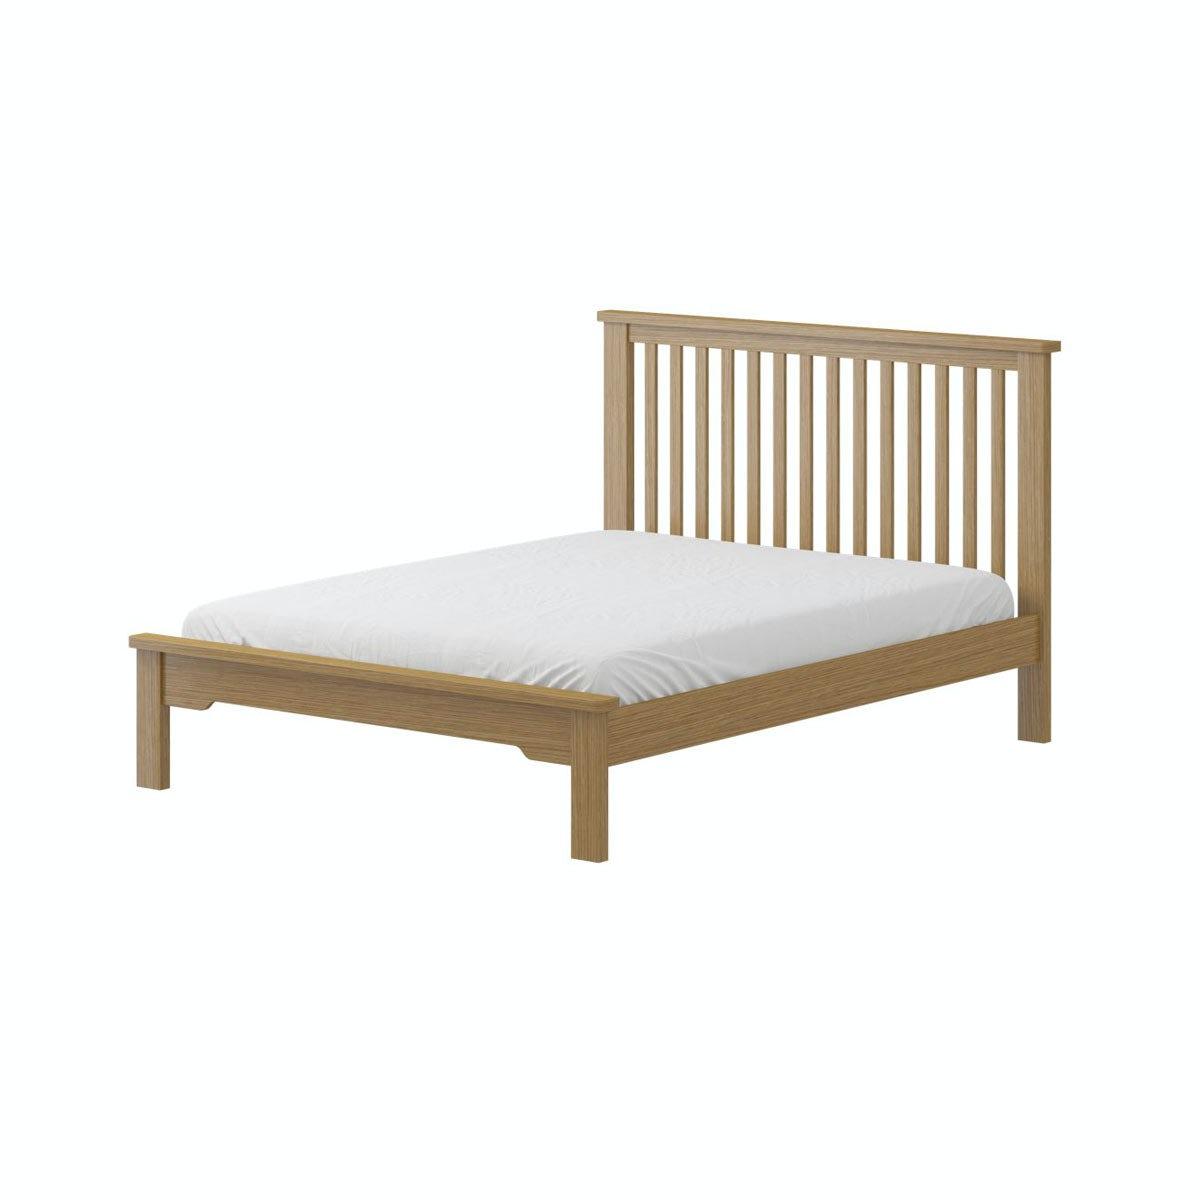 mfi rome oak double bed. Black Bedroom Furniture Sets. Home Design Ideas